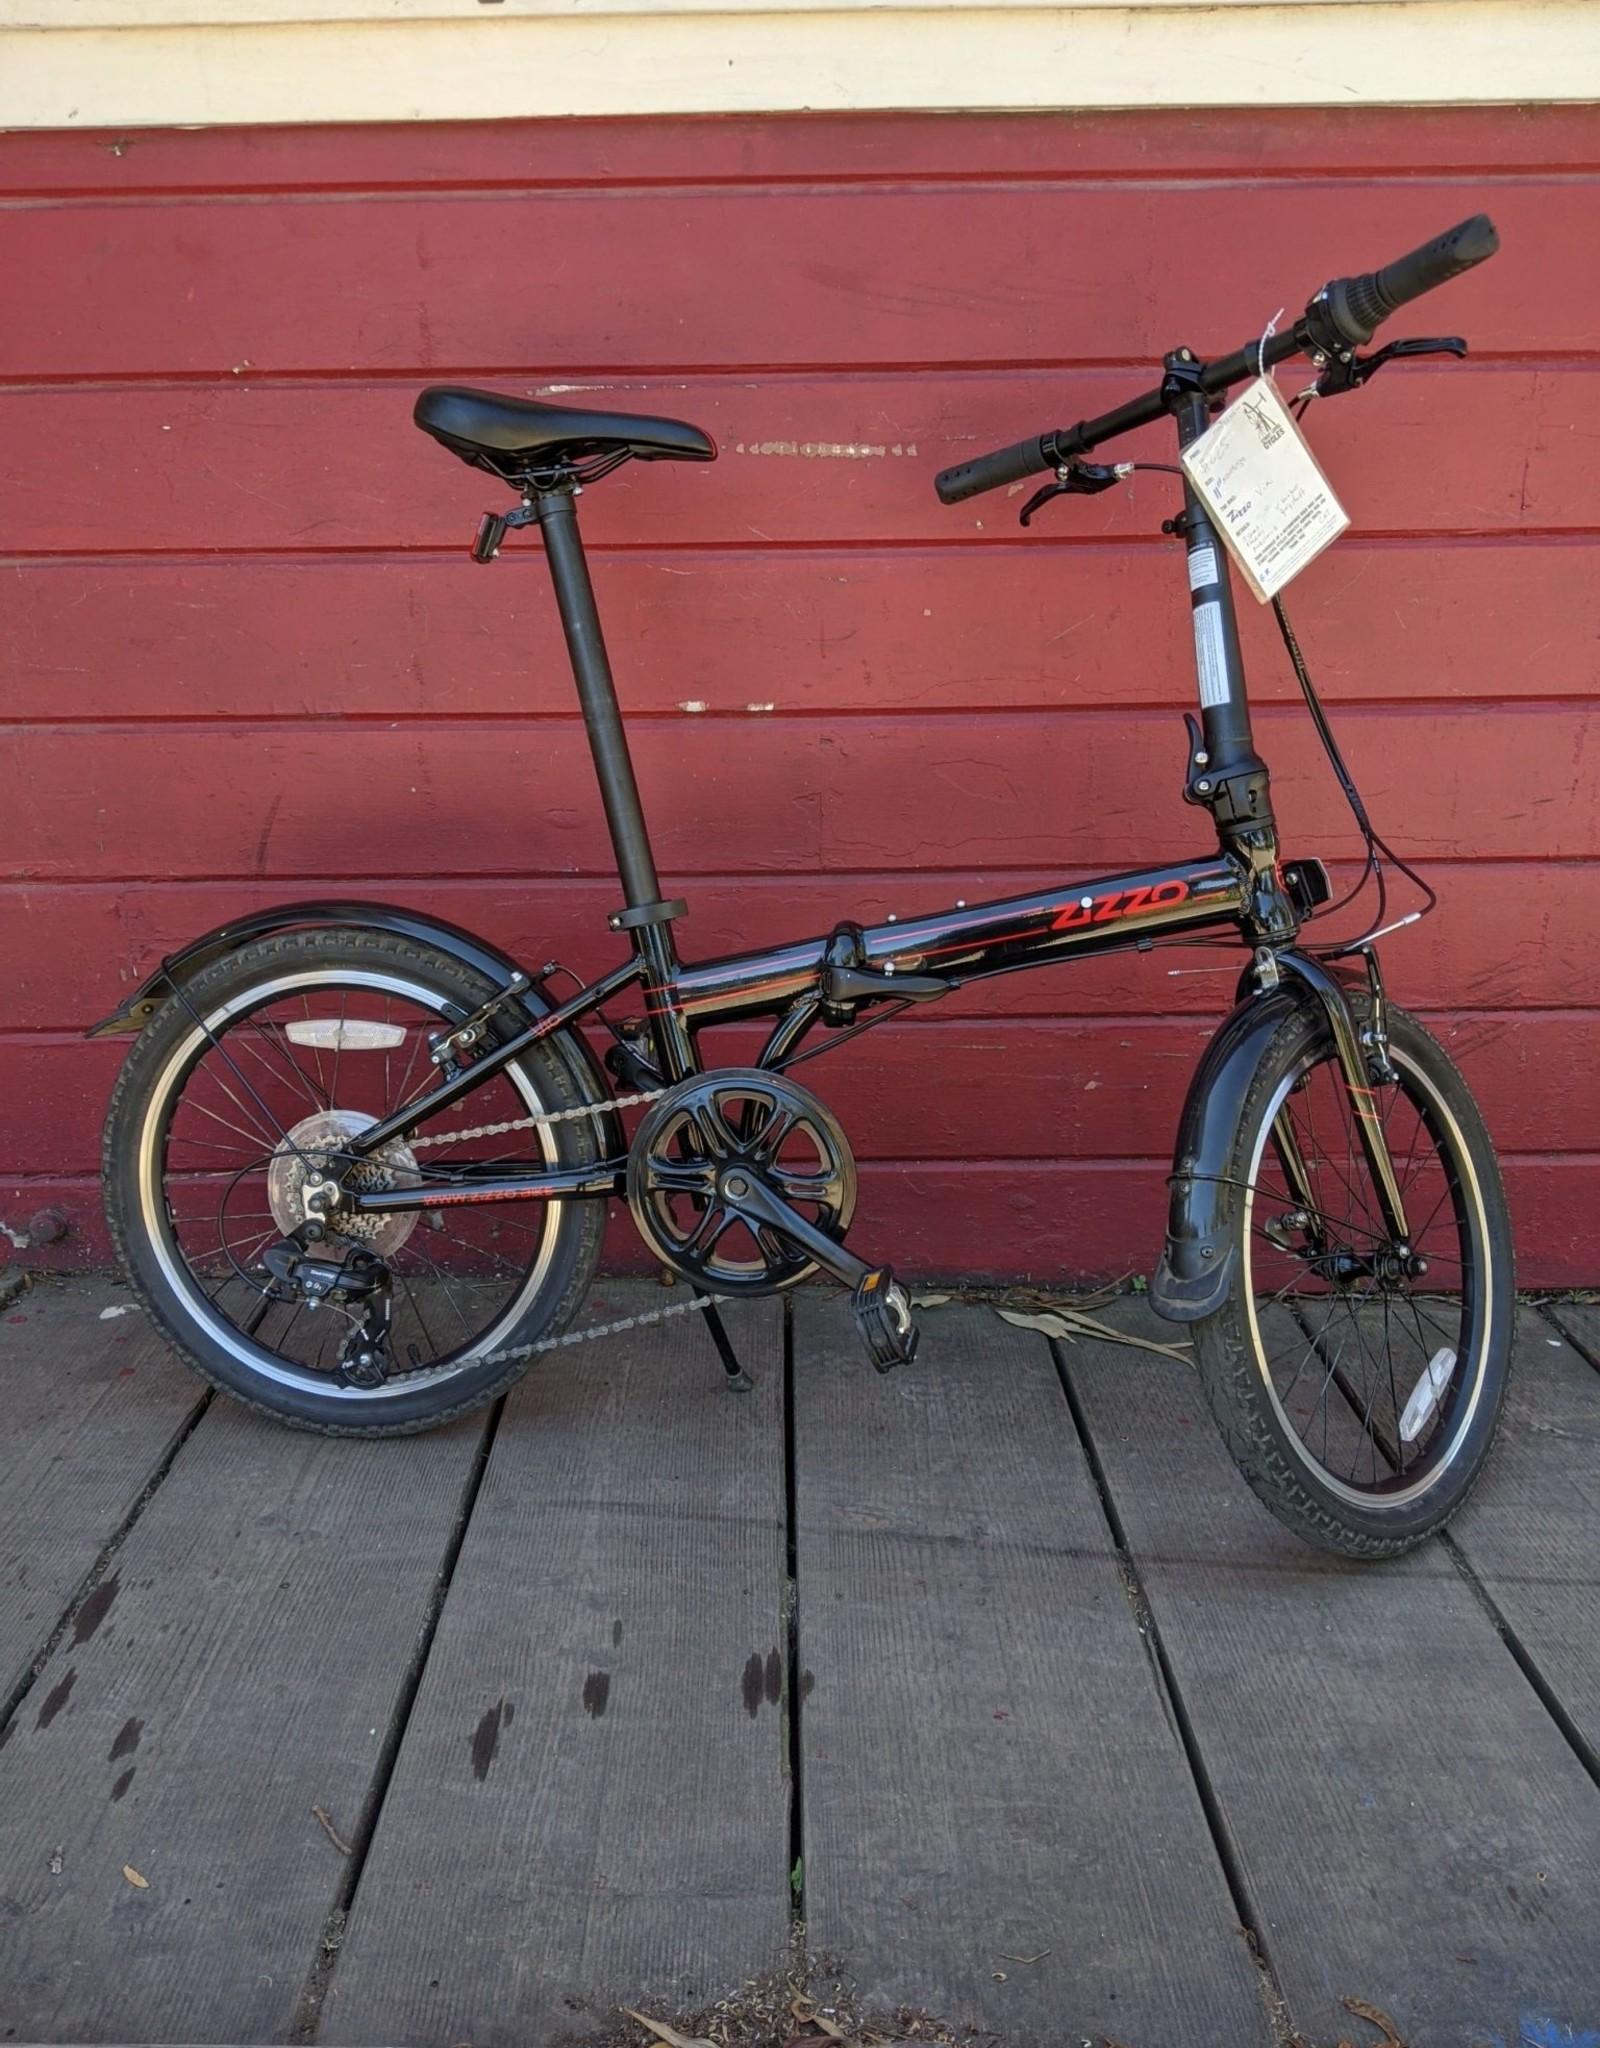 Zizzo Via Folding bike (one size fits most)